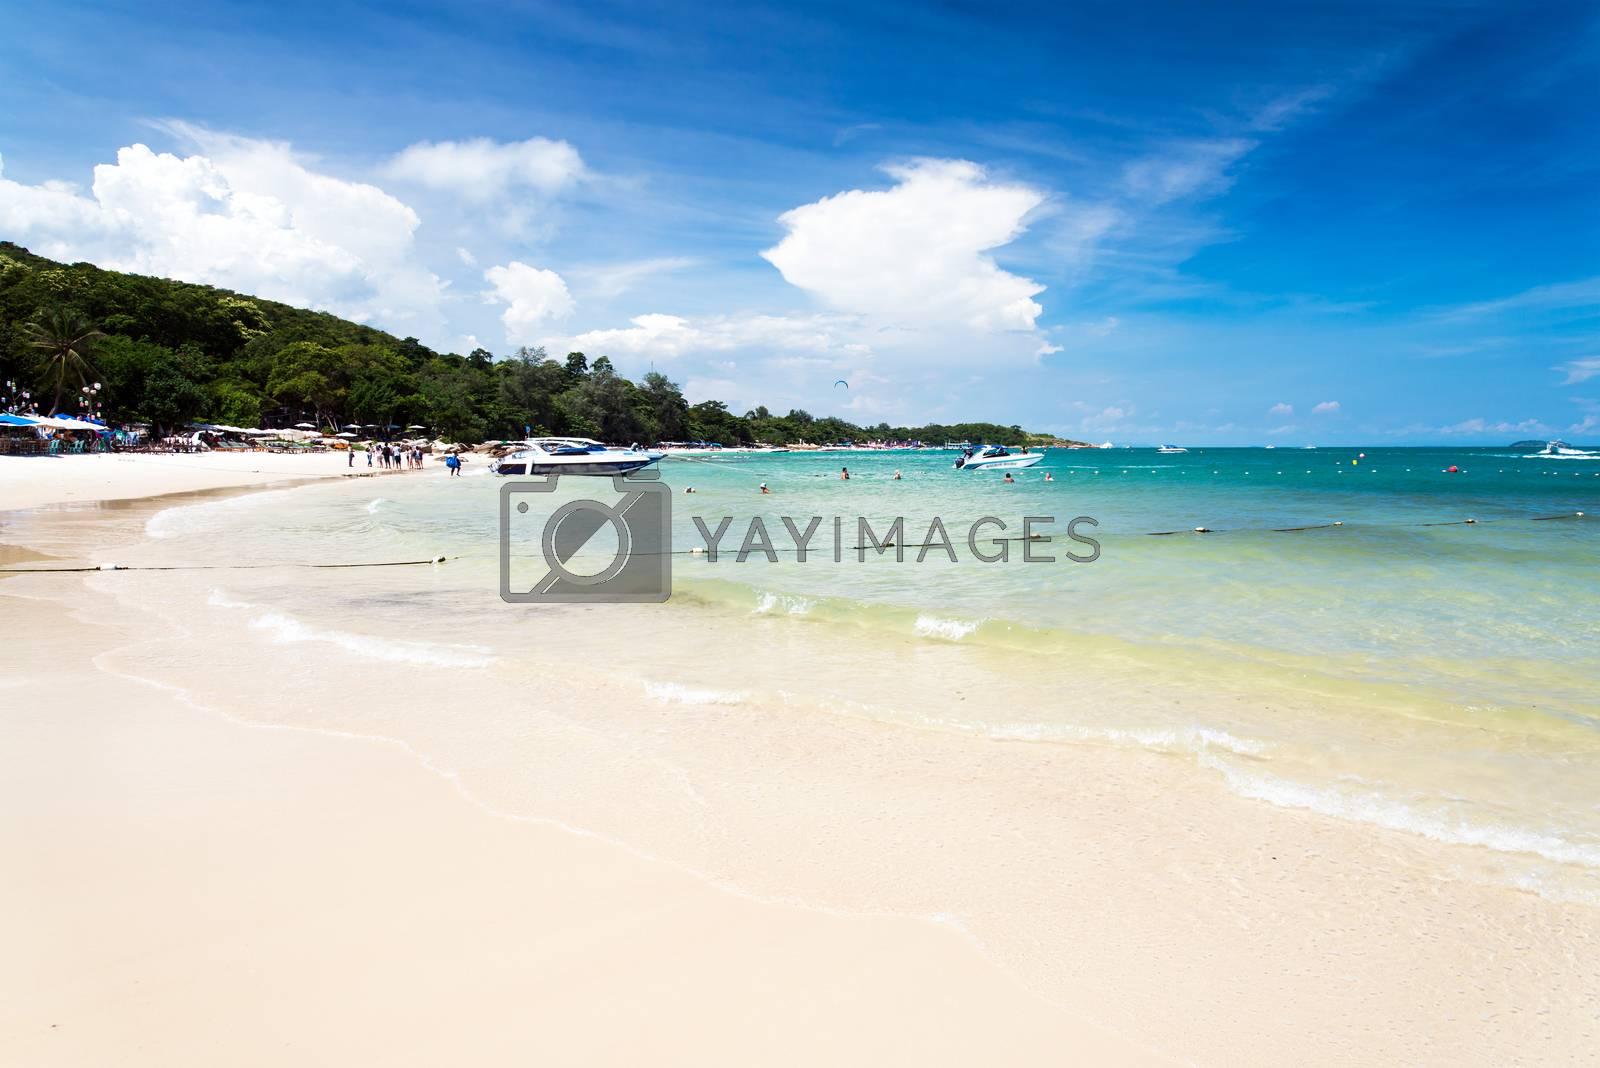 Sai Kaew Beach, Mu Koh Samet - Khao Laem Ya National Park, Rayon by jakgree